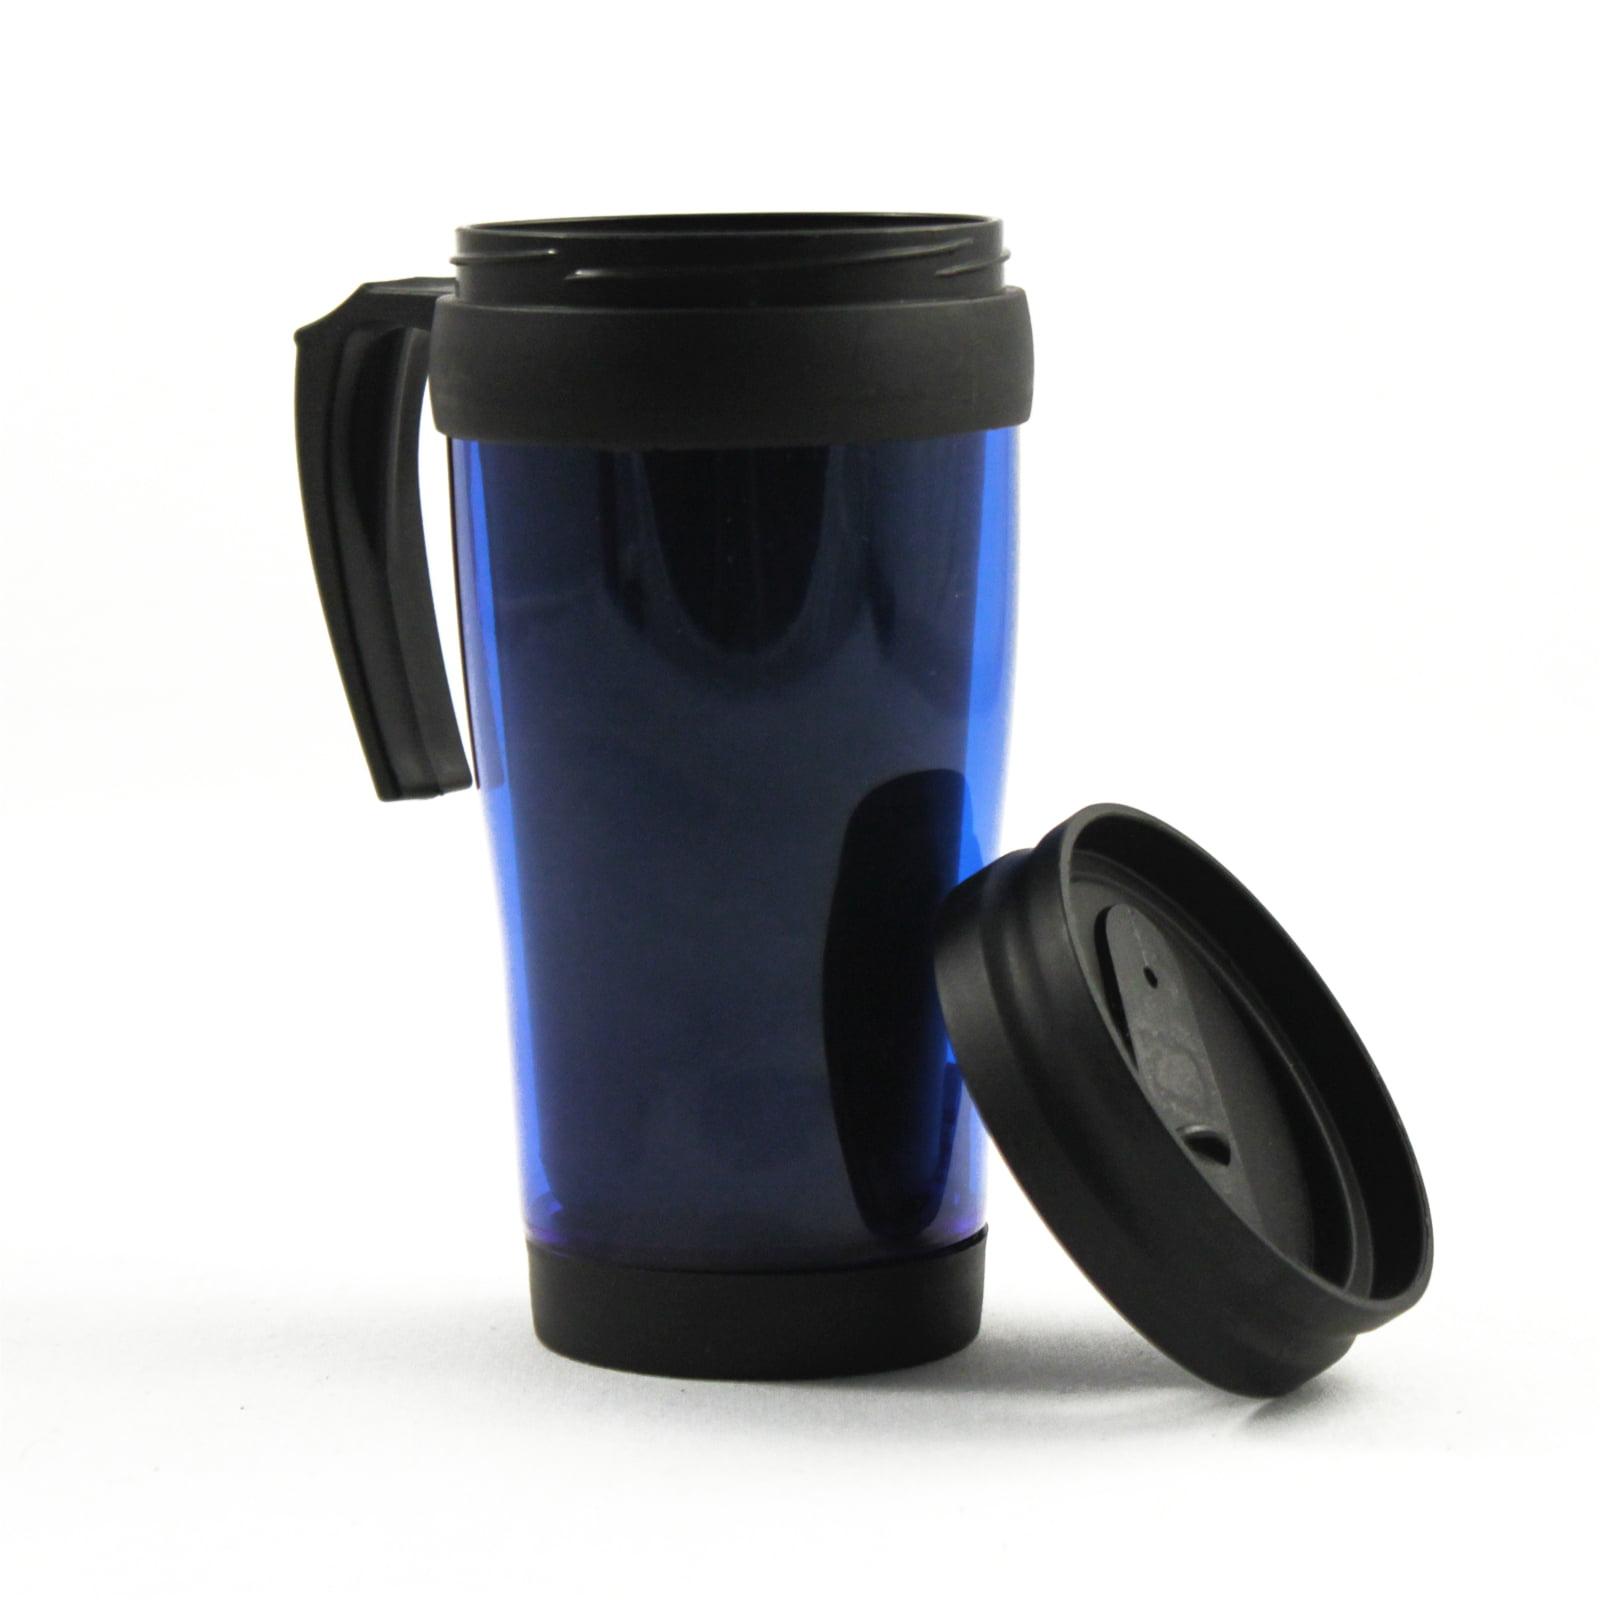 16oz blue travel mug car coffee cup tumbler auto beverage holder